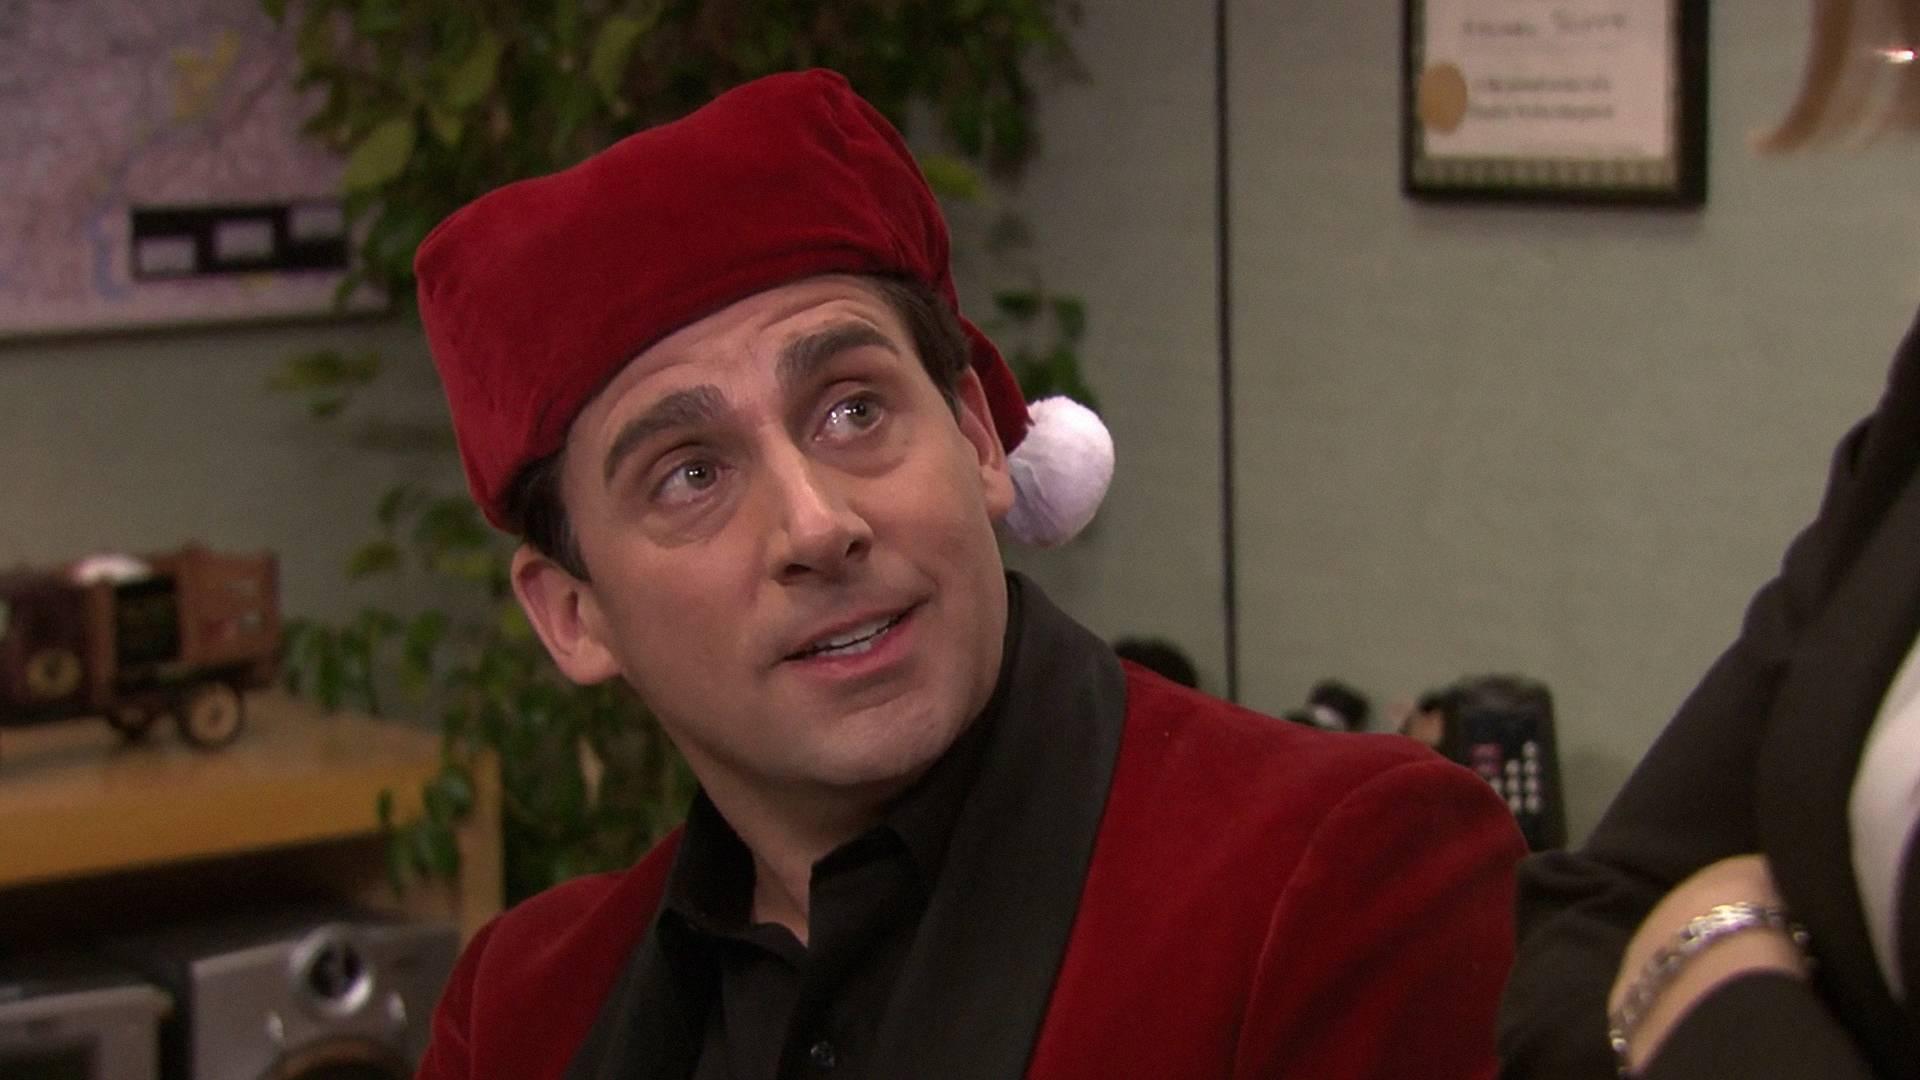 The Office Season 7 Episode 12